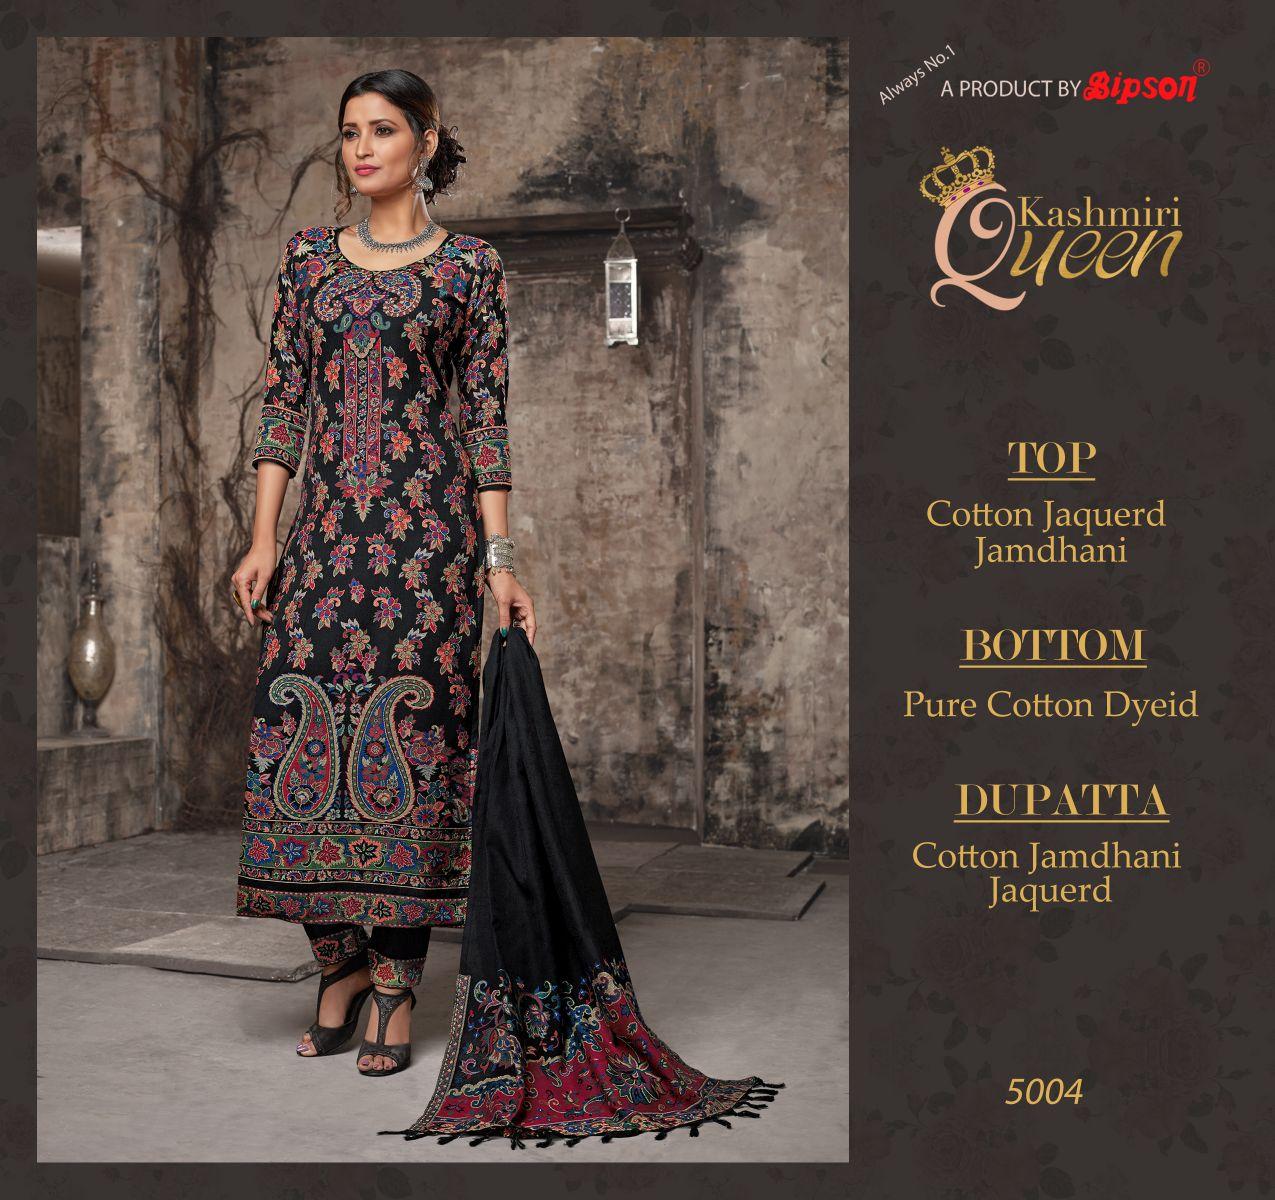 Bipson Kashmiri Queen 5004